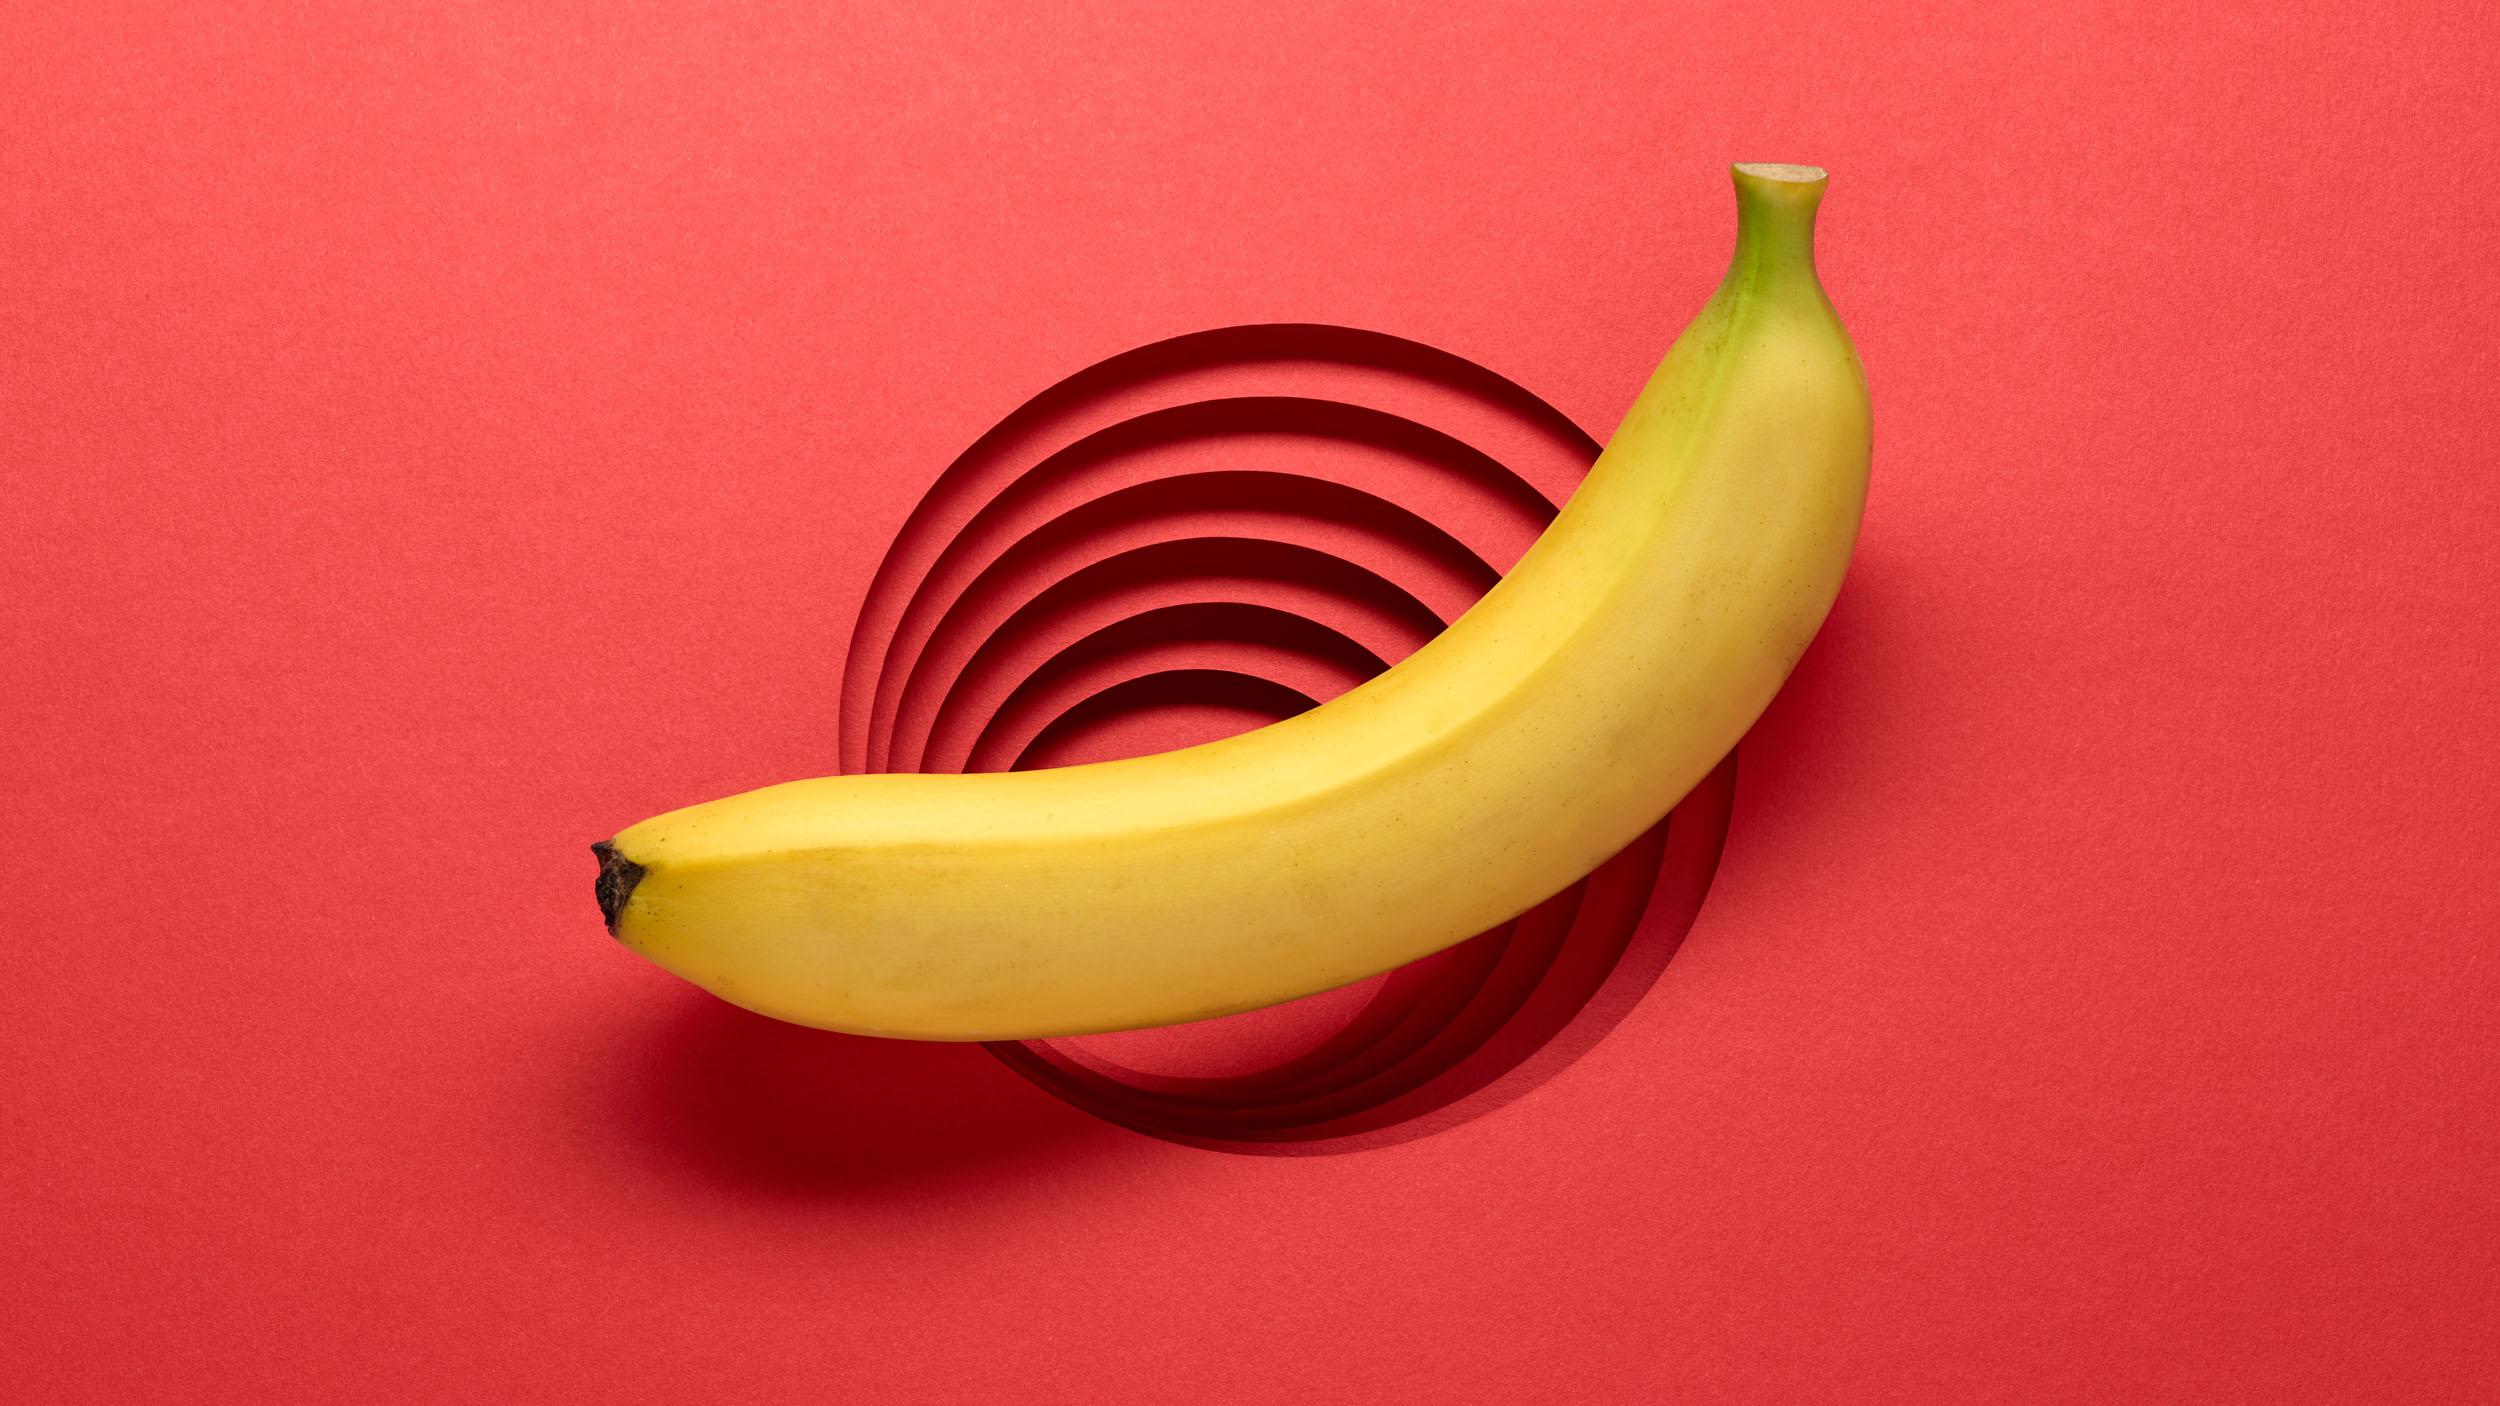 180201_GeometricFruit_Banana_PB-4.jpg